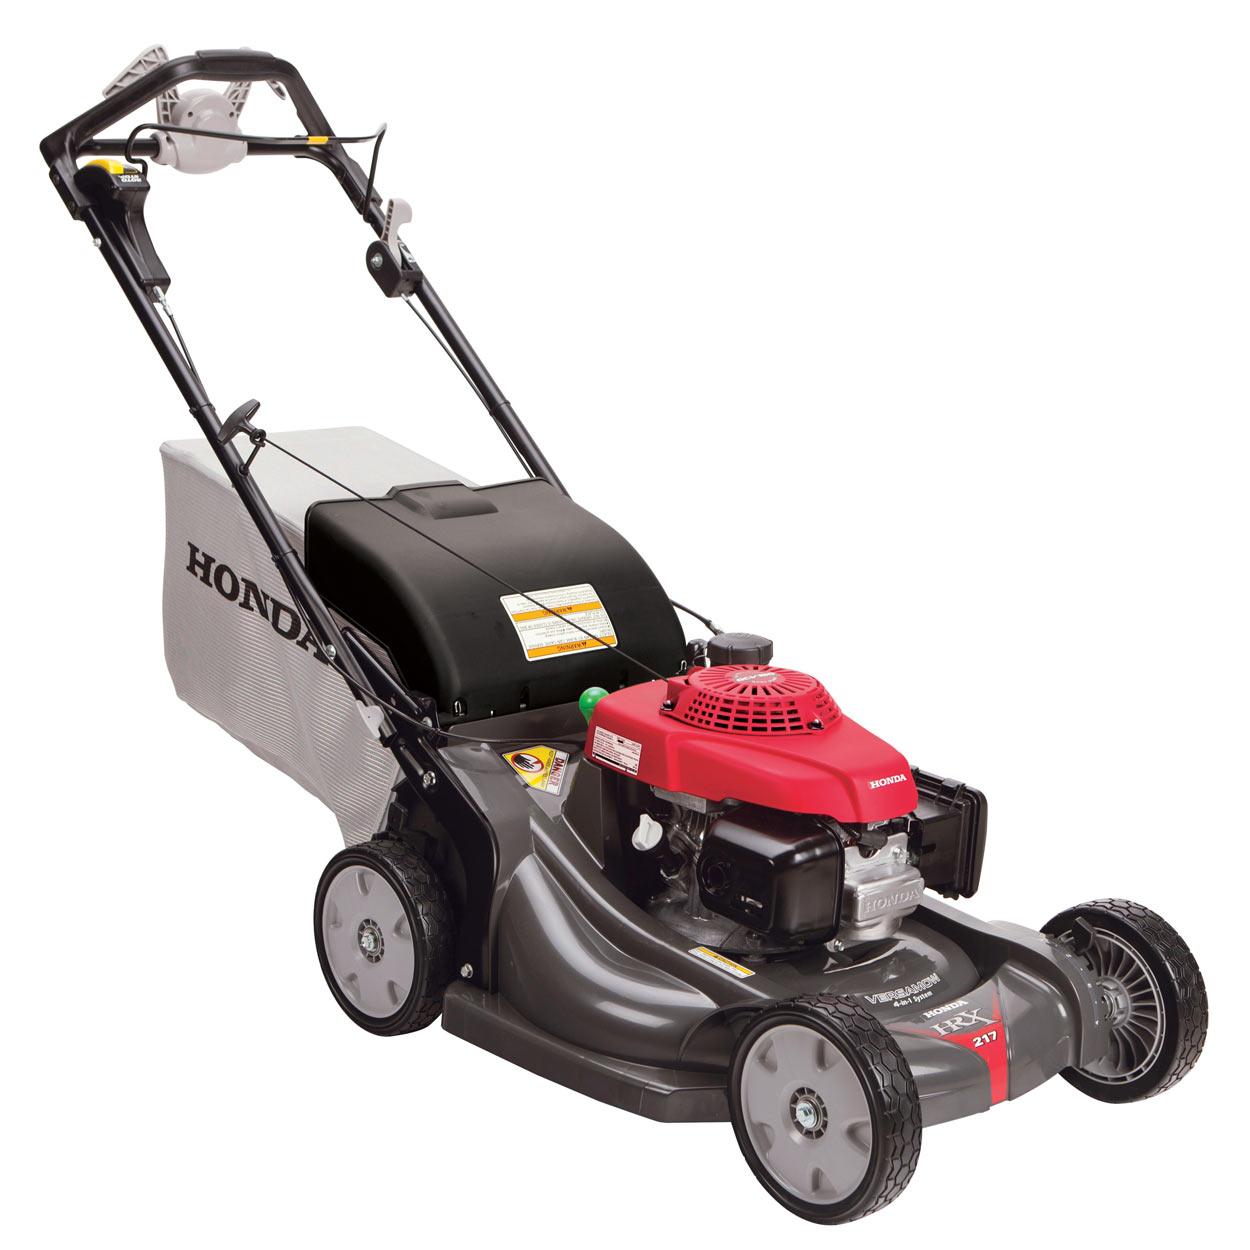 Honda HRX217VYA lawn mower